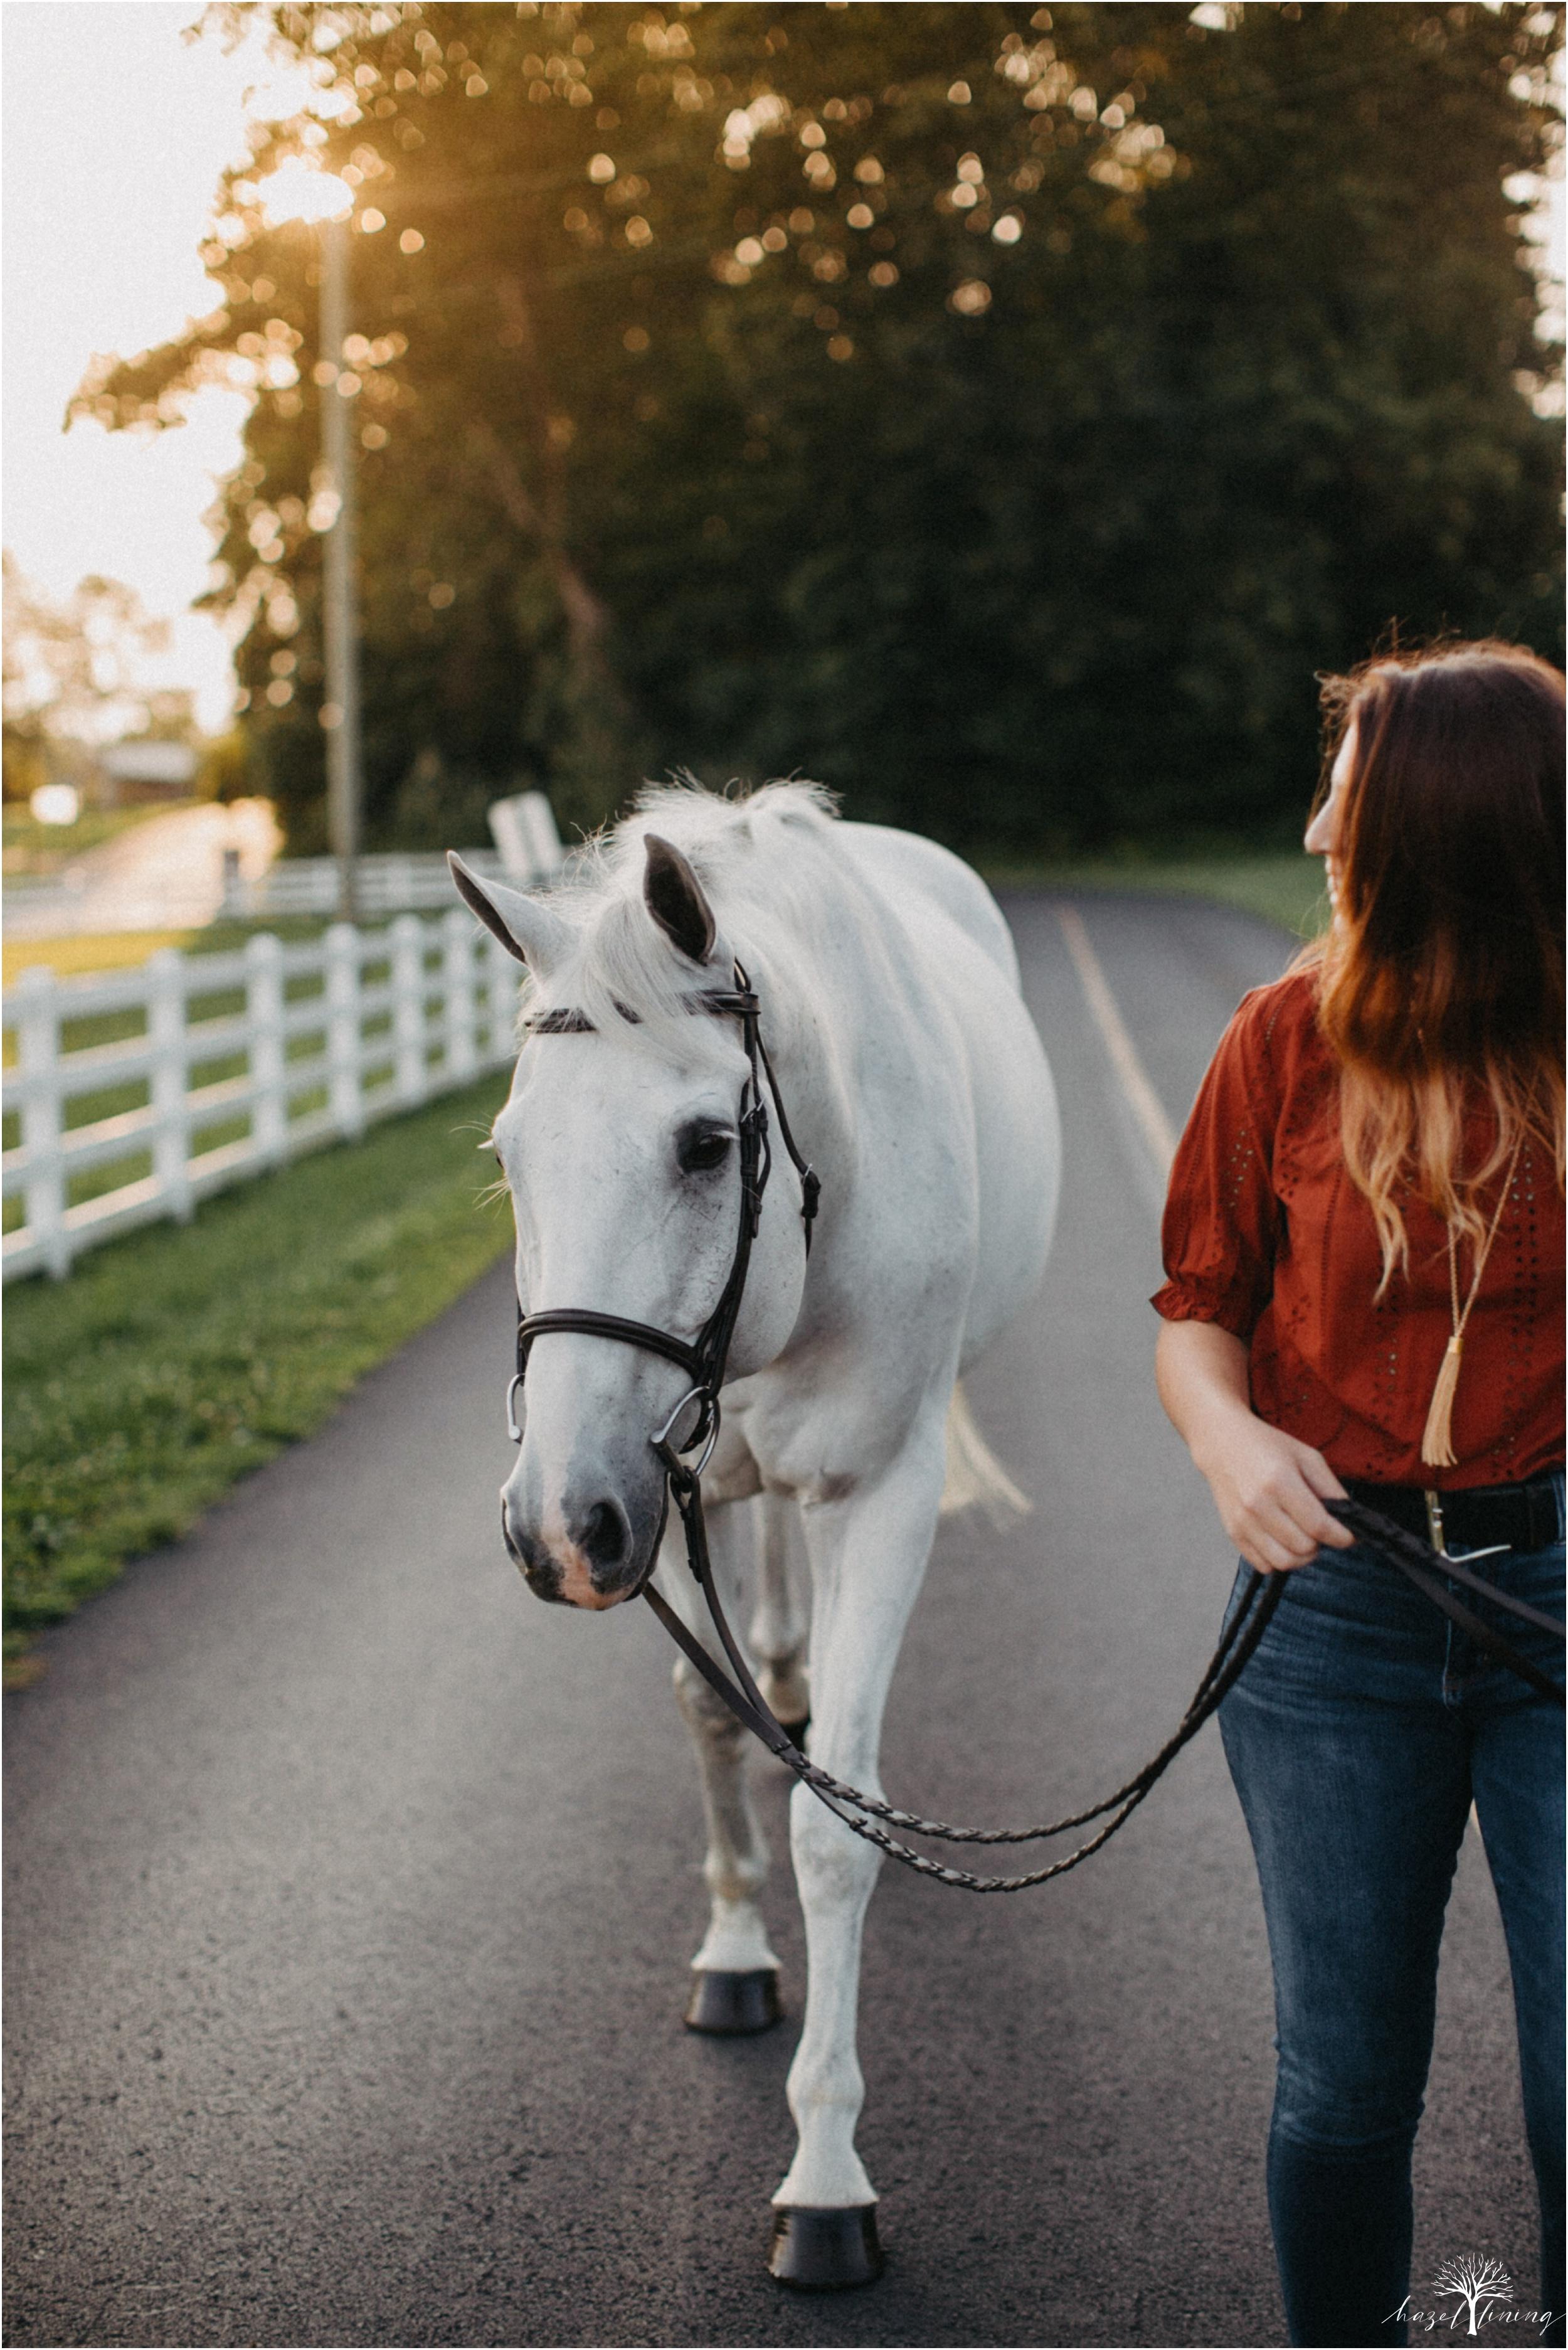 taylor-adams-and-horse-delaware-valley-university-delval-summer-equestrian-portrait-session-hazel-lining-photography-destination-elopement-wedding-engagement-photography_0014.jpg